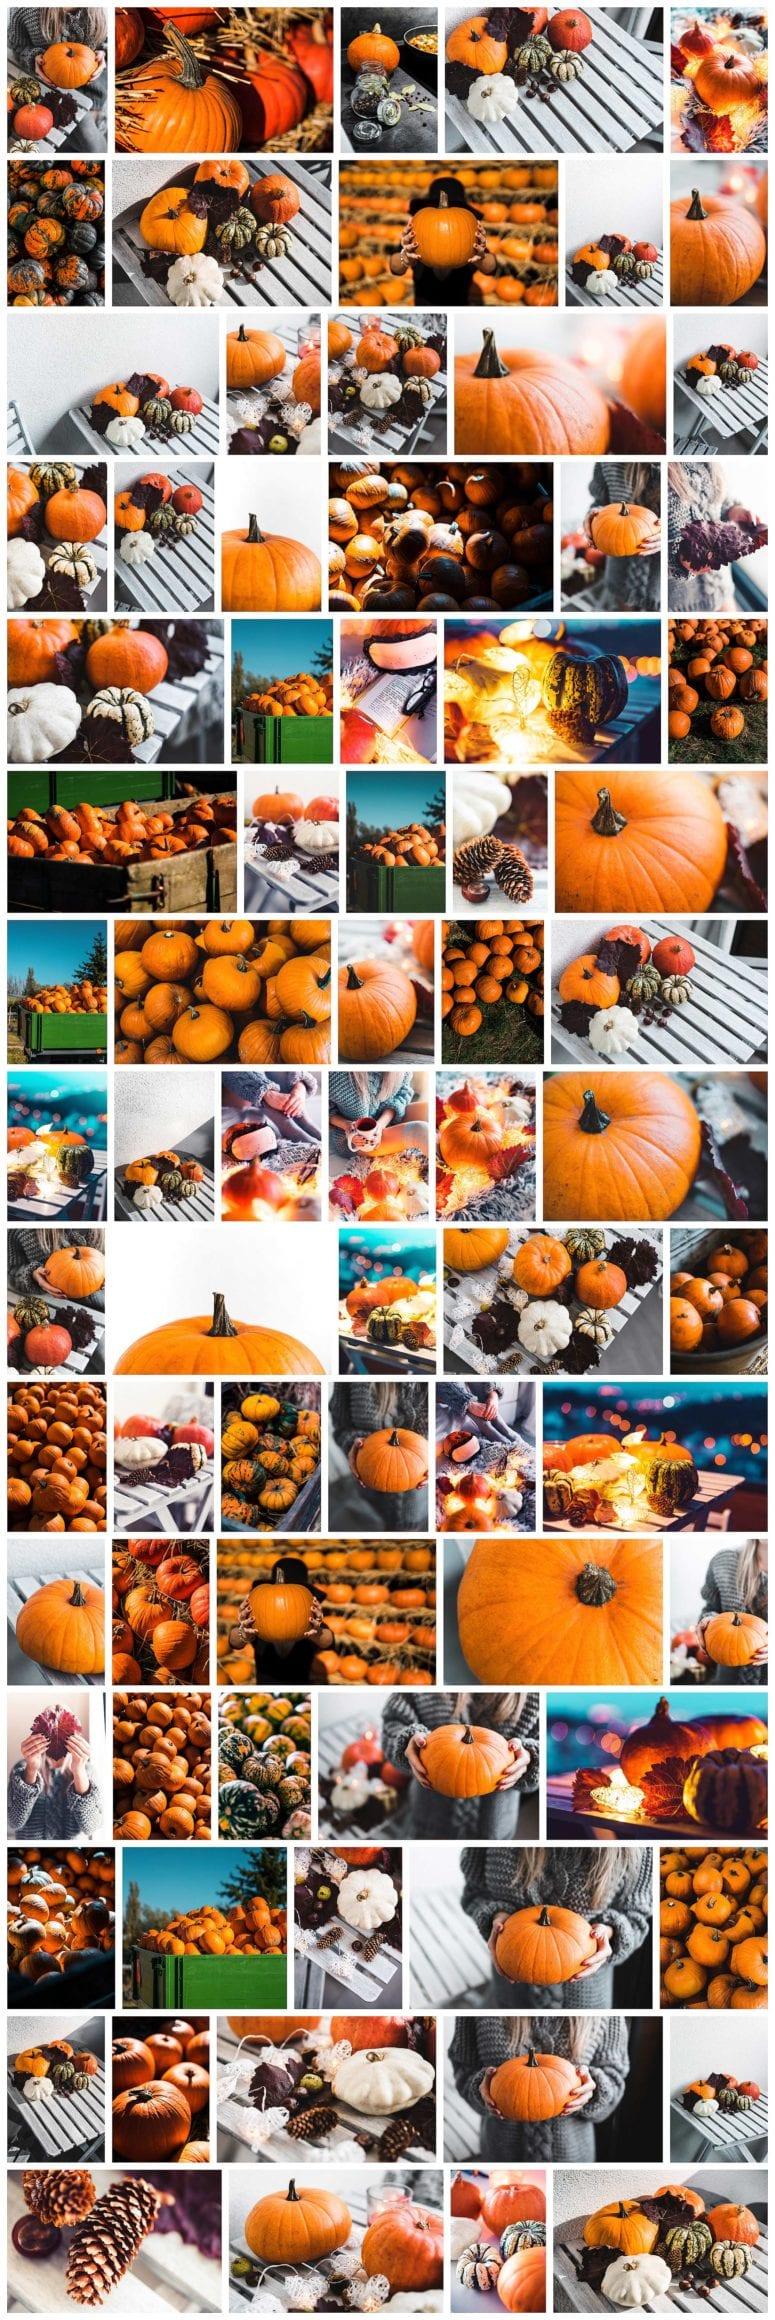 halloween mood - 77 Halloween stock fotografií: picjumbo vydává další fotokolekci